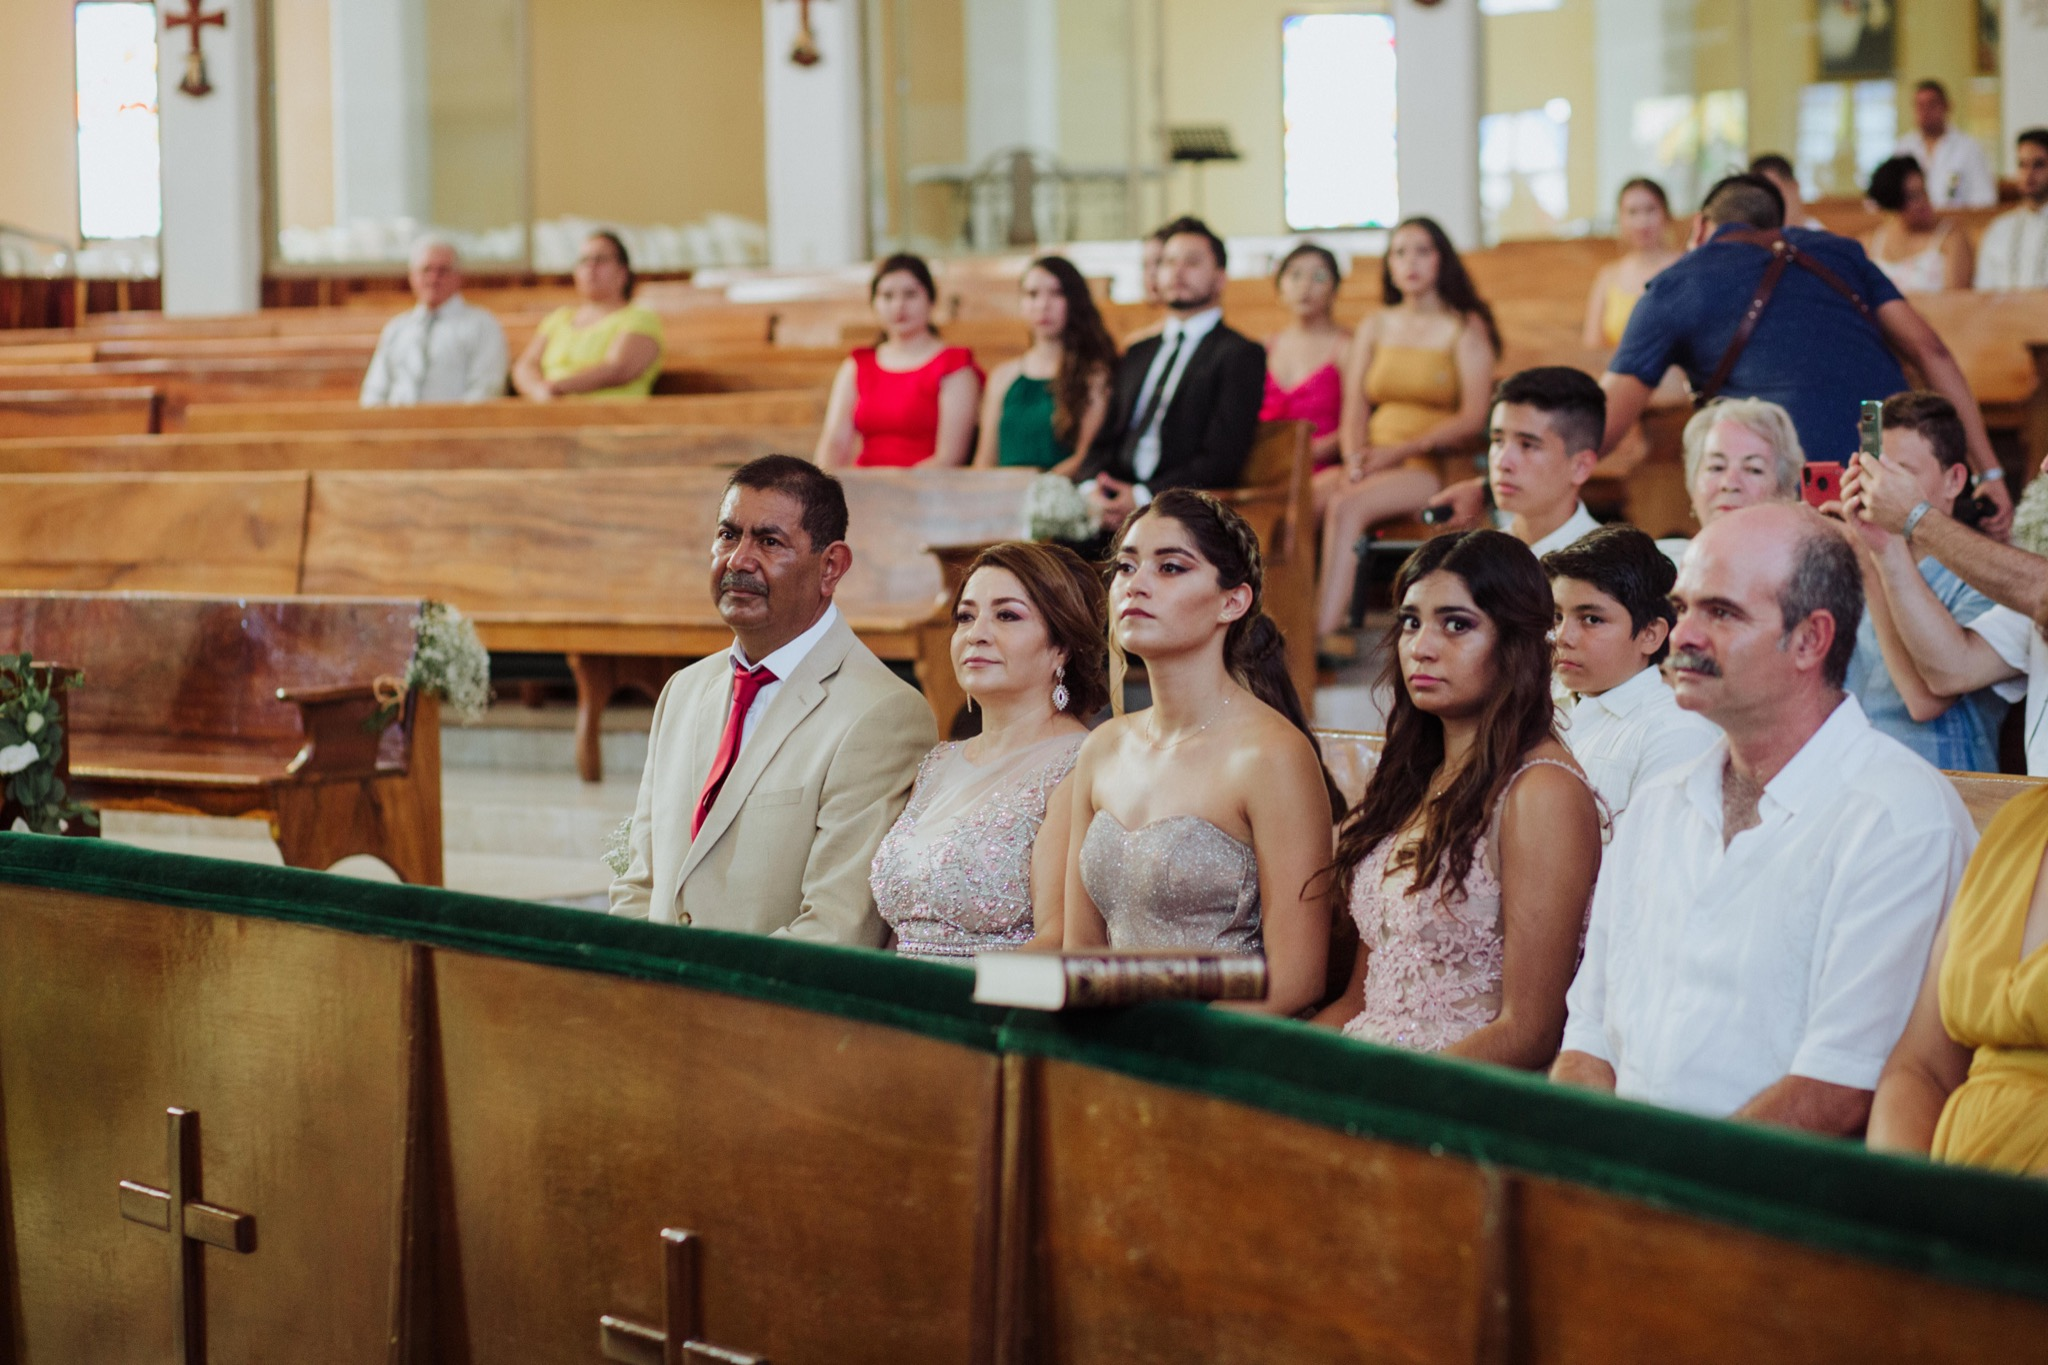 Javier_noriega_fotografo_bodas_profesional_zacatecas_mexico_mazatlan_sinaloa_photographer_weddings23